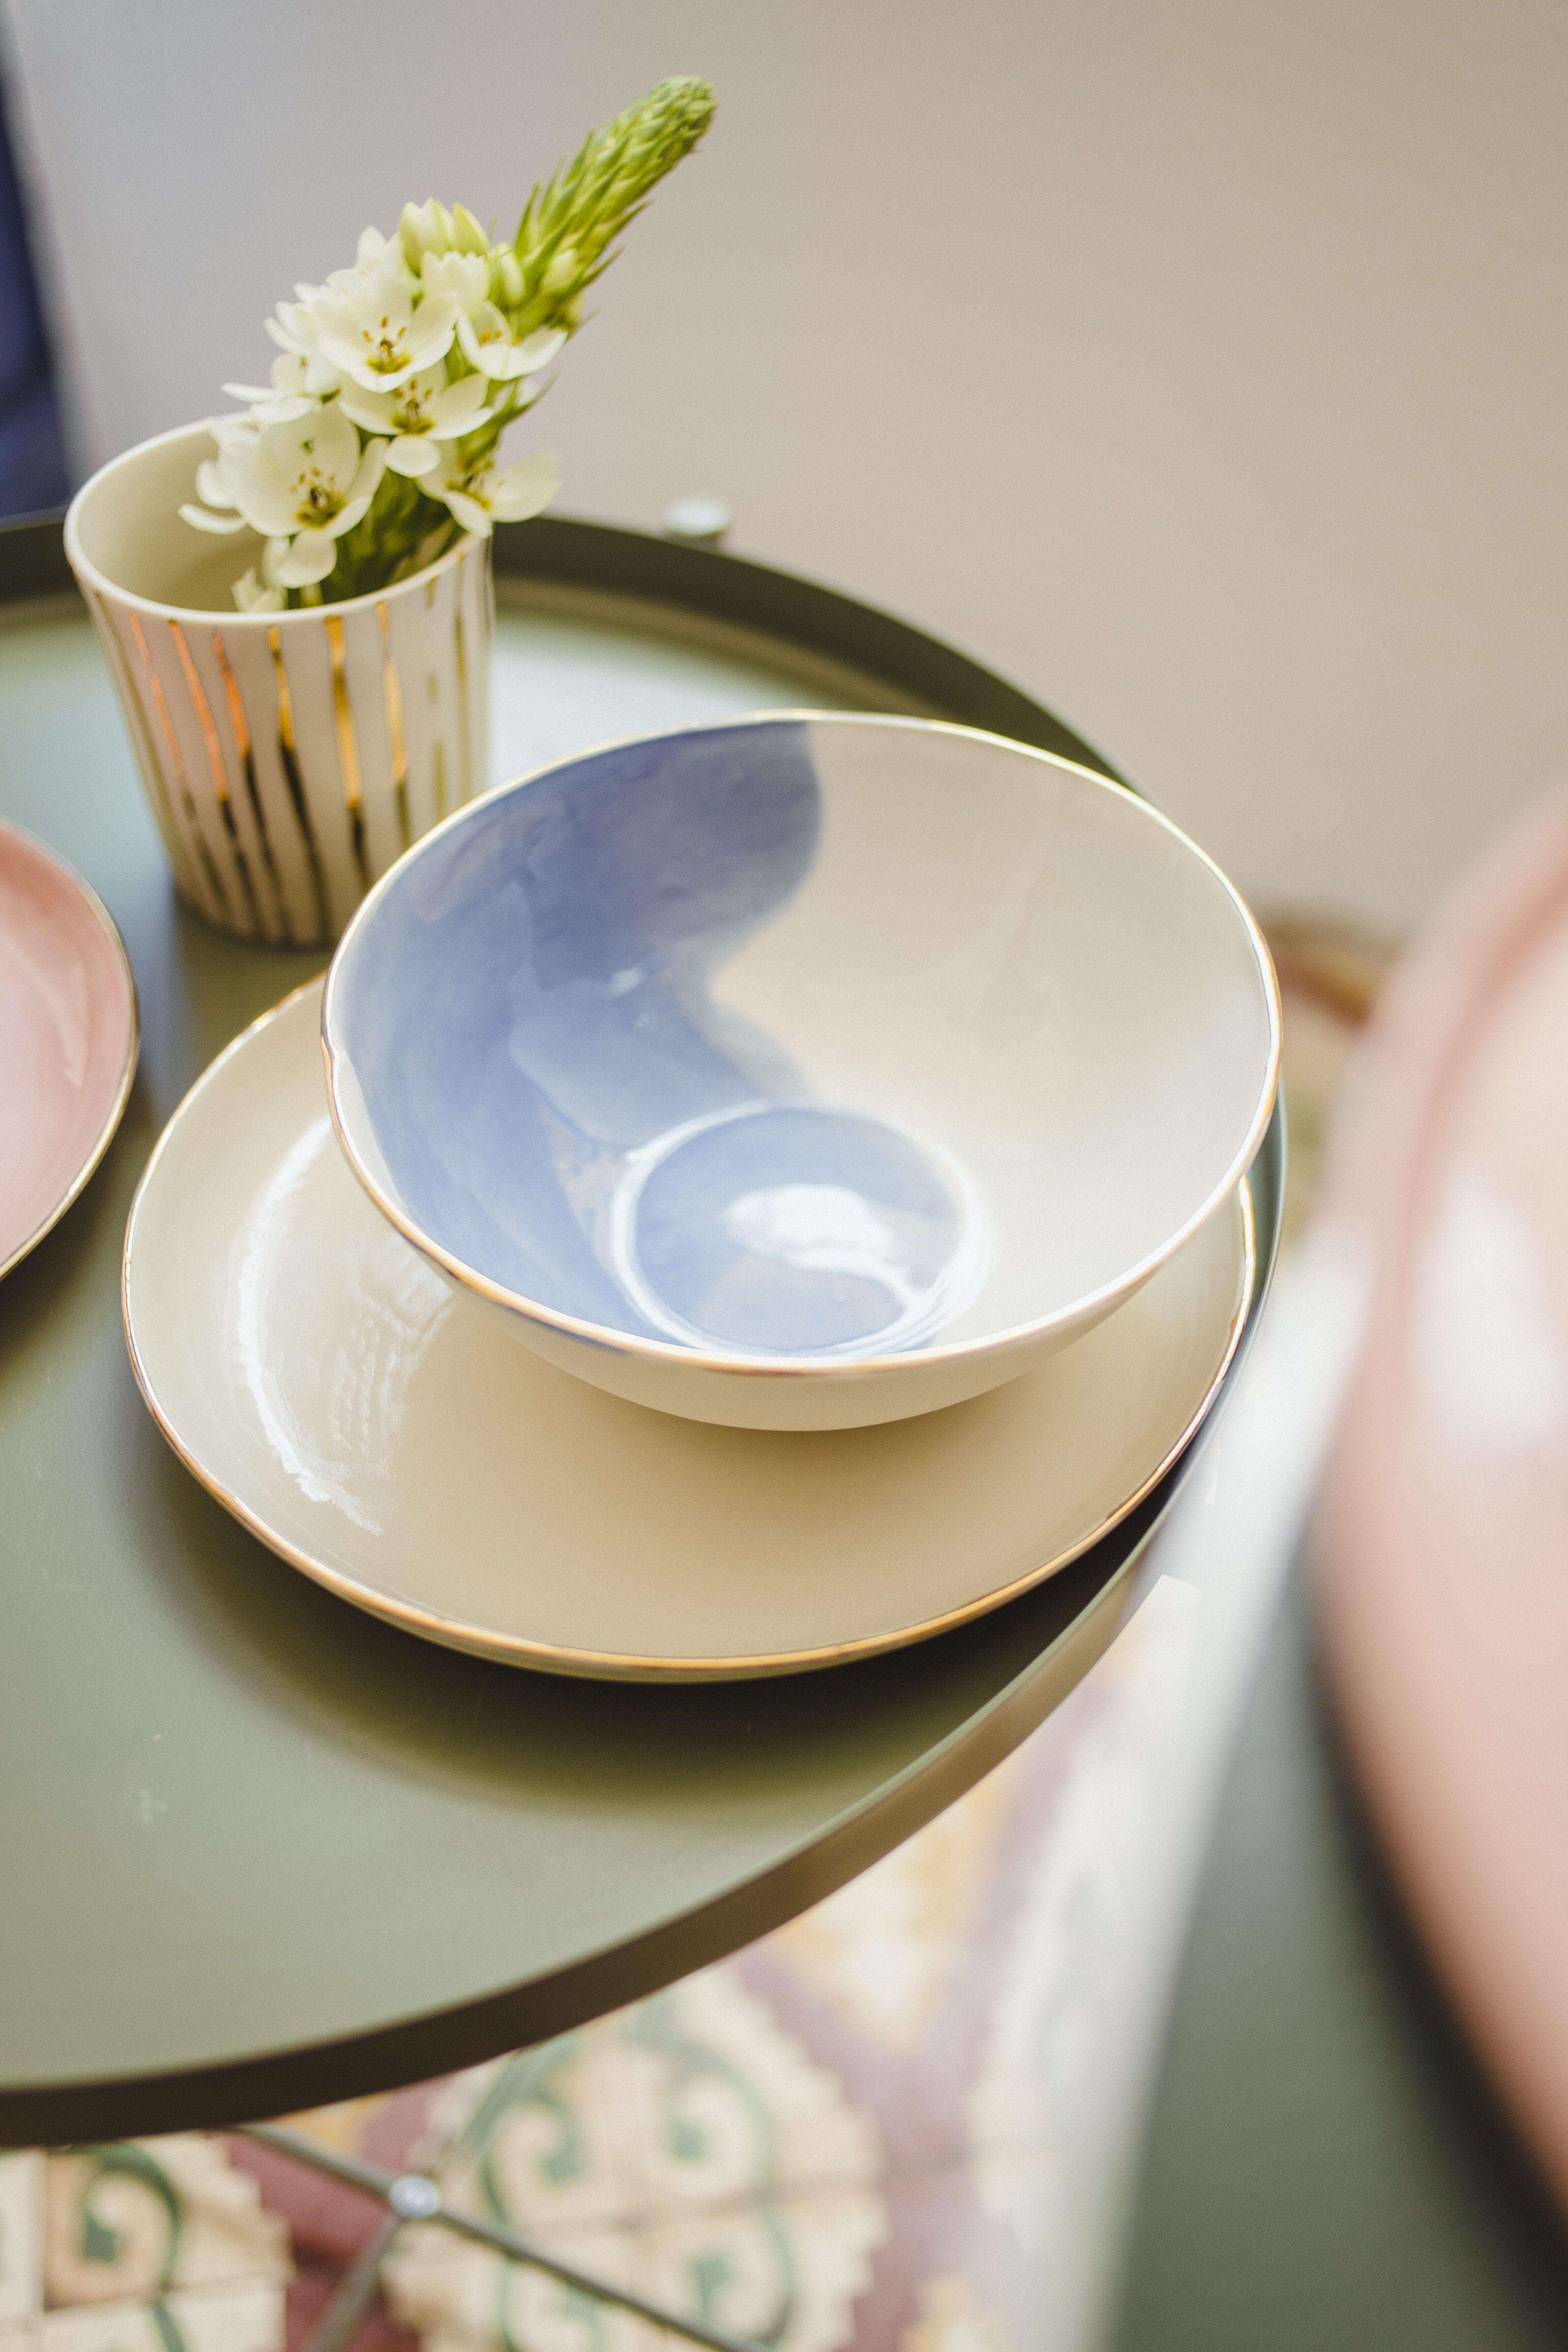 Corelle Blue 48 Piece Dinnerware Set Serves 12 Place Setting Dish Bowl Plate Cu